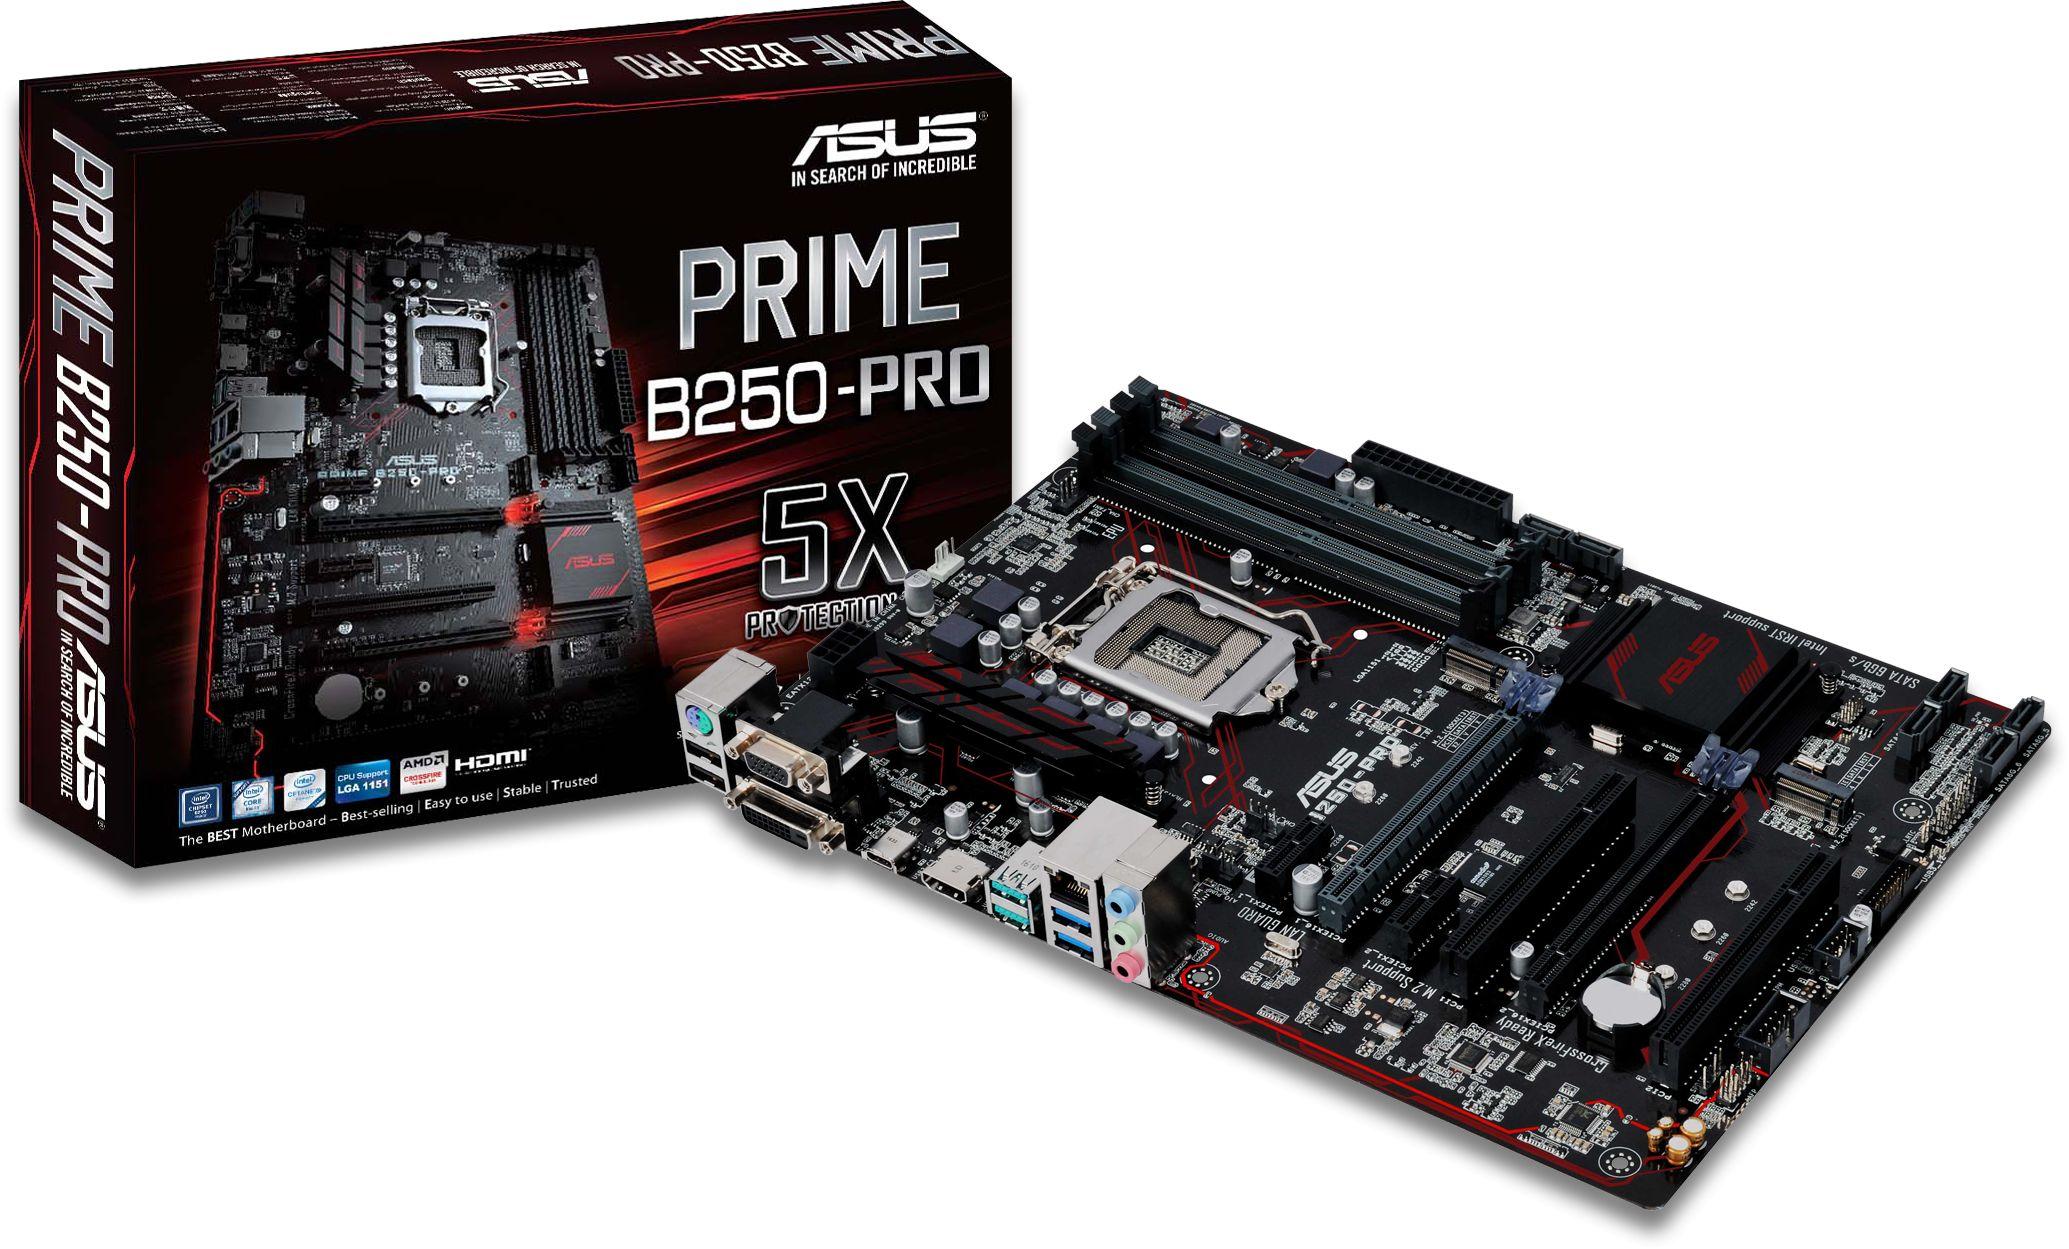 PRIME B250 PRO LGA1151 ATX Motherboard